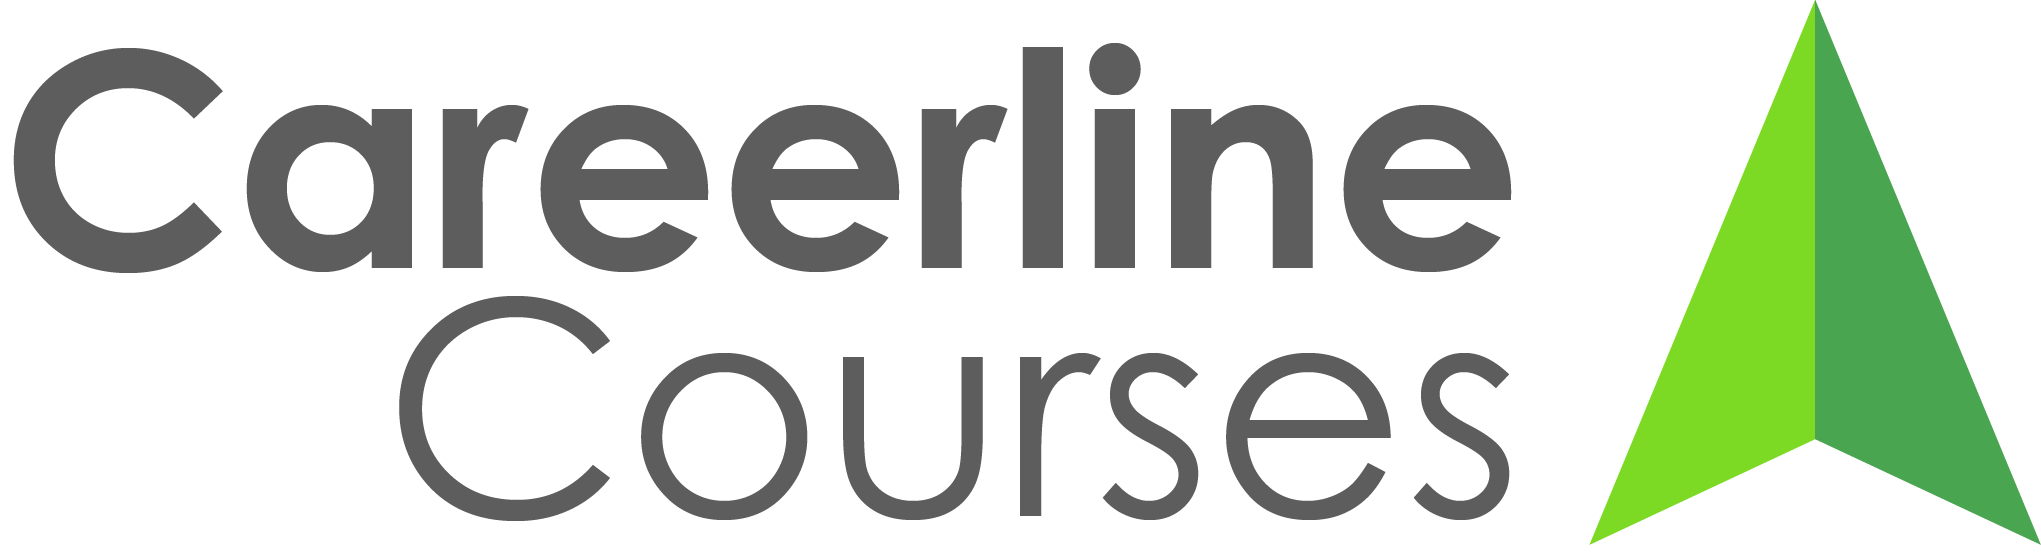 Careerline Courses